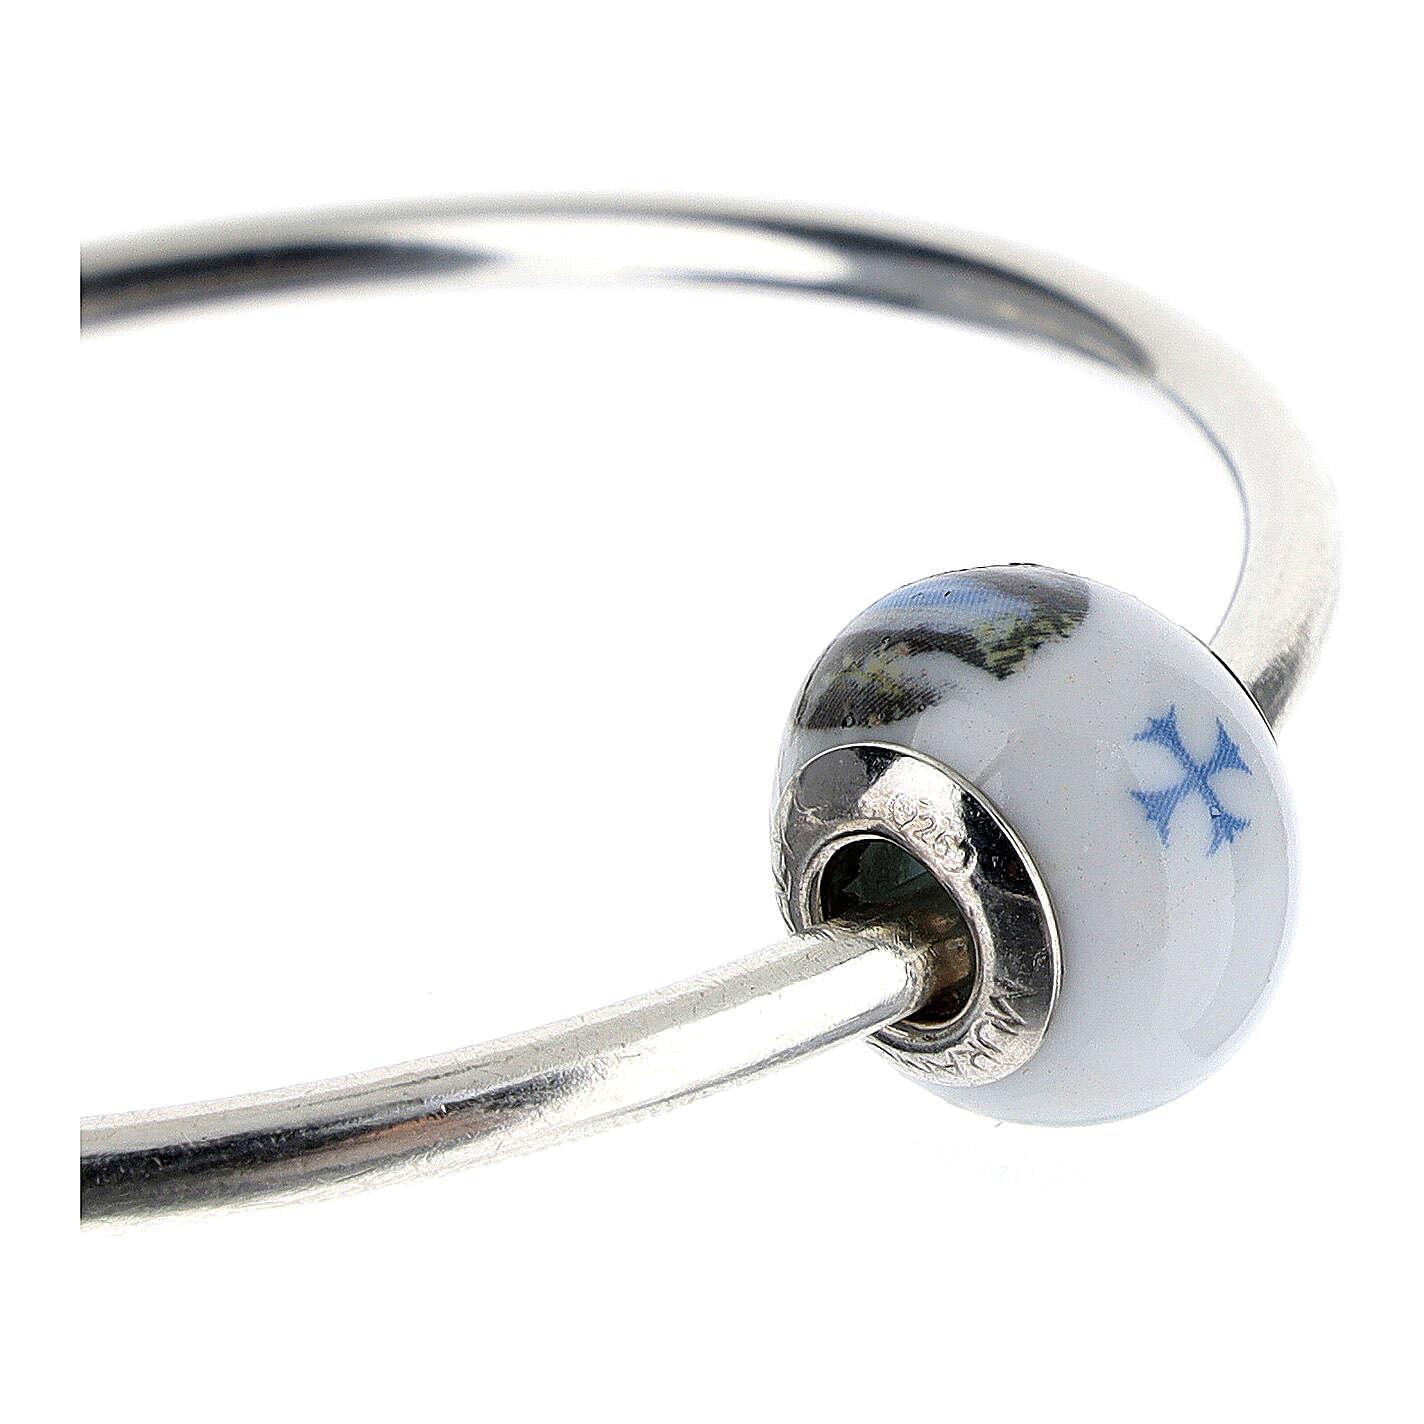 Perla pasante pulseras collares Virgen Lourdes vidrio Murano plata 925 4